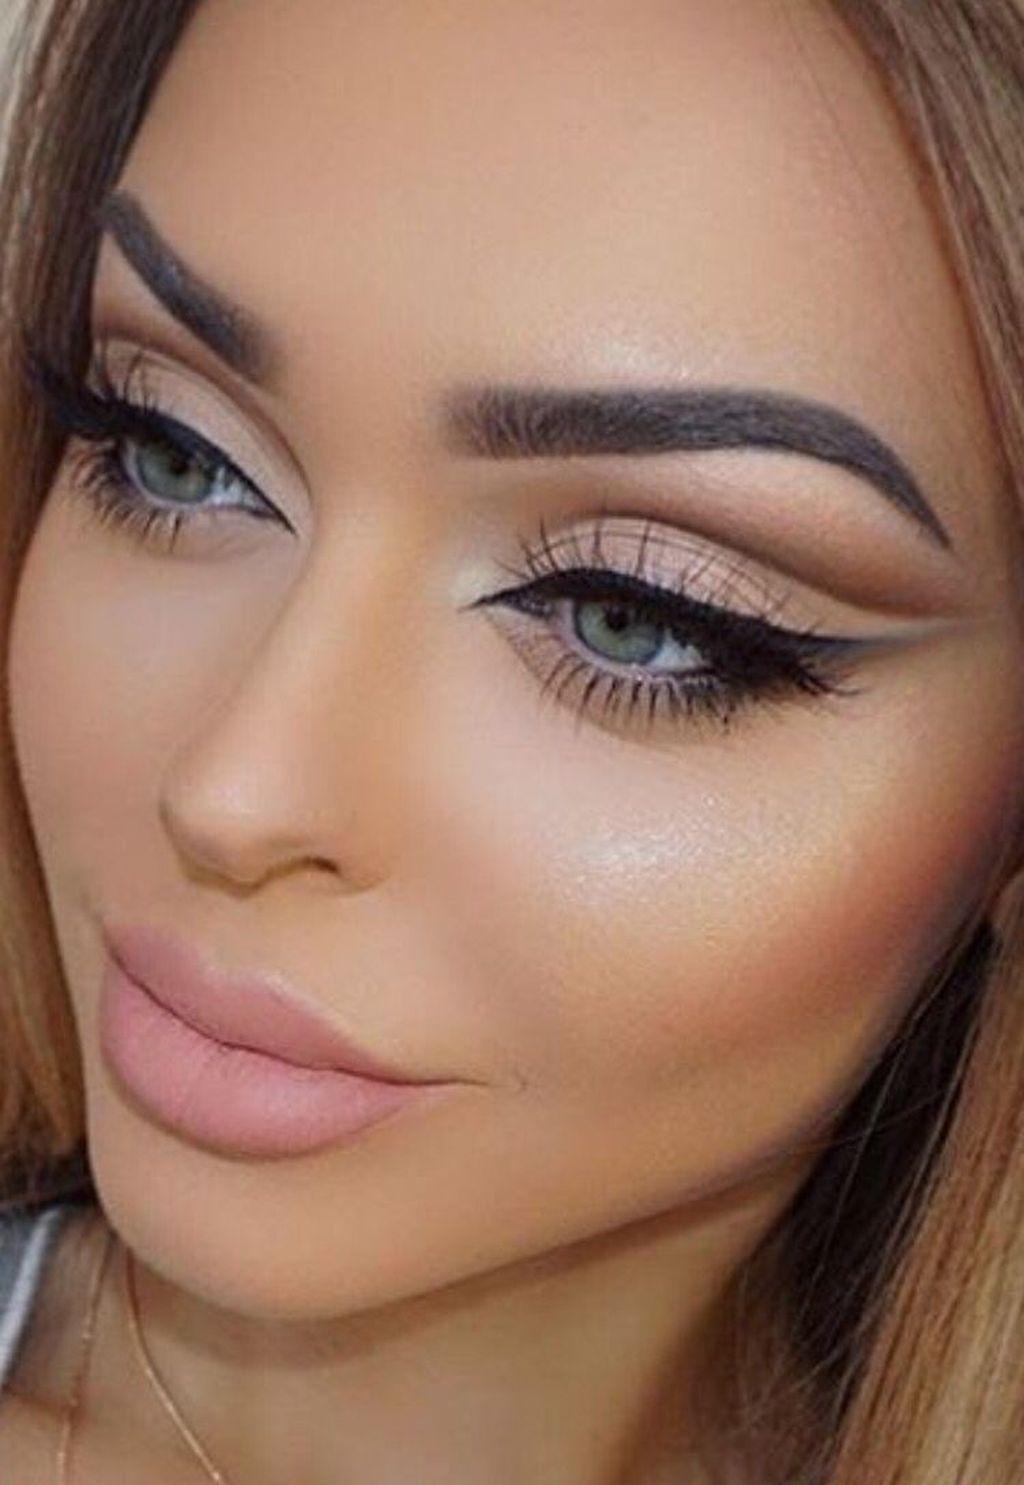 34 Beauty Smokey Eye Makeup Ideas | Zapisz to | Pinterest | Smokey ...